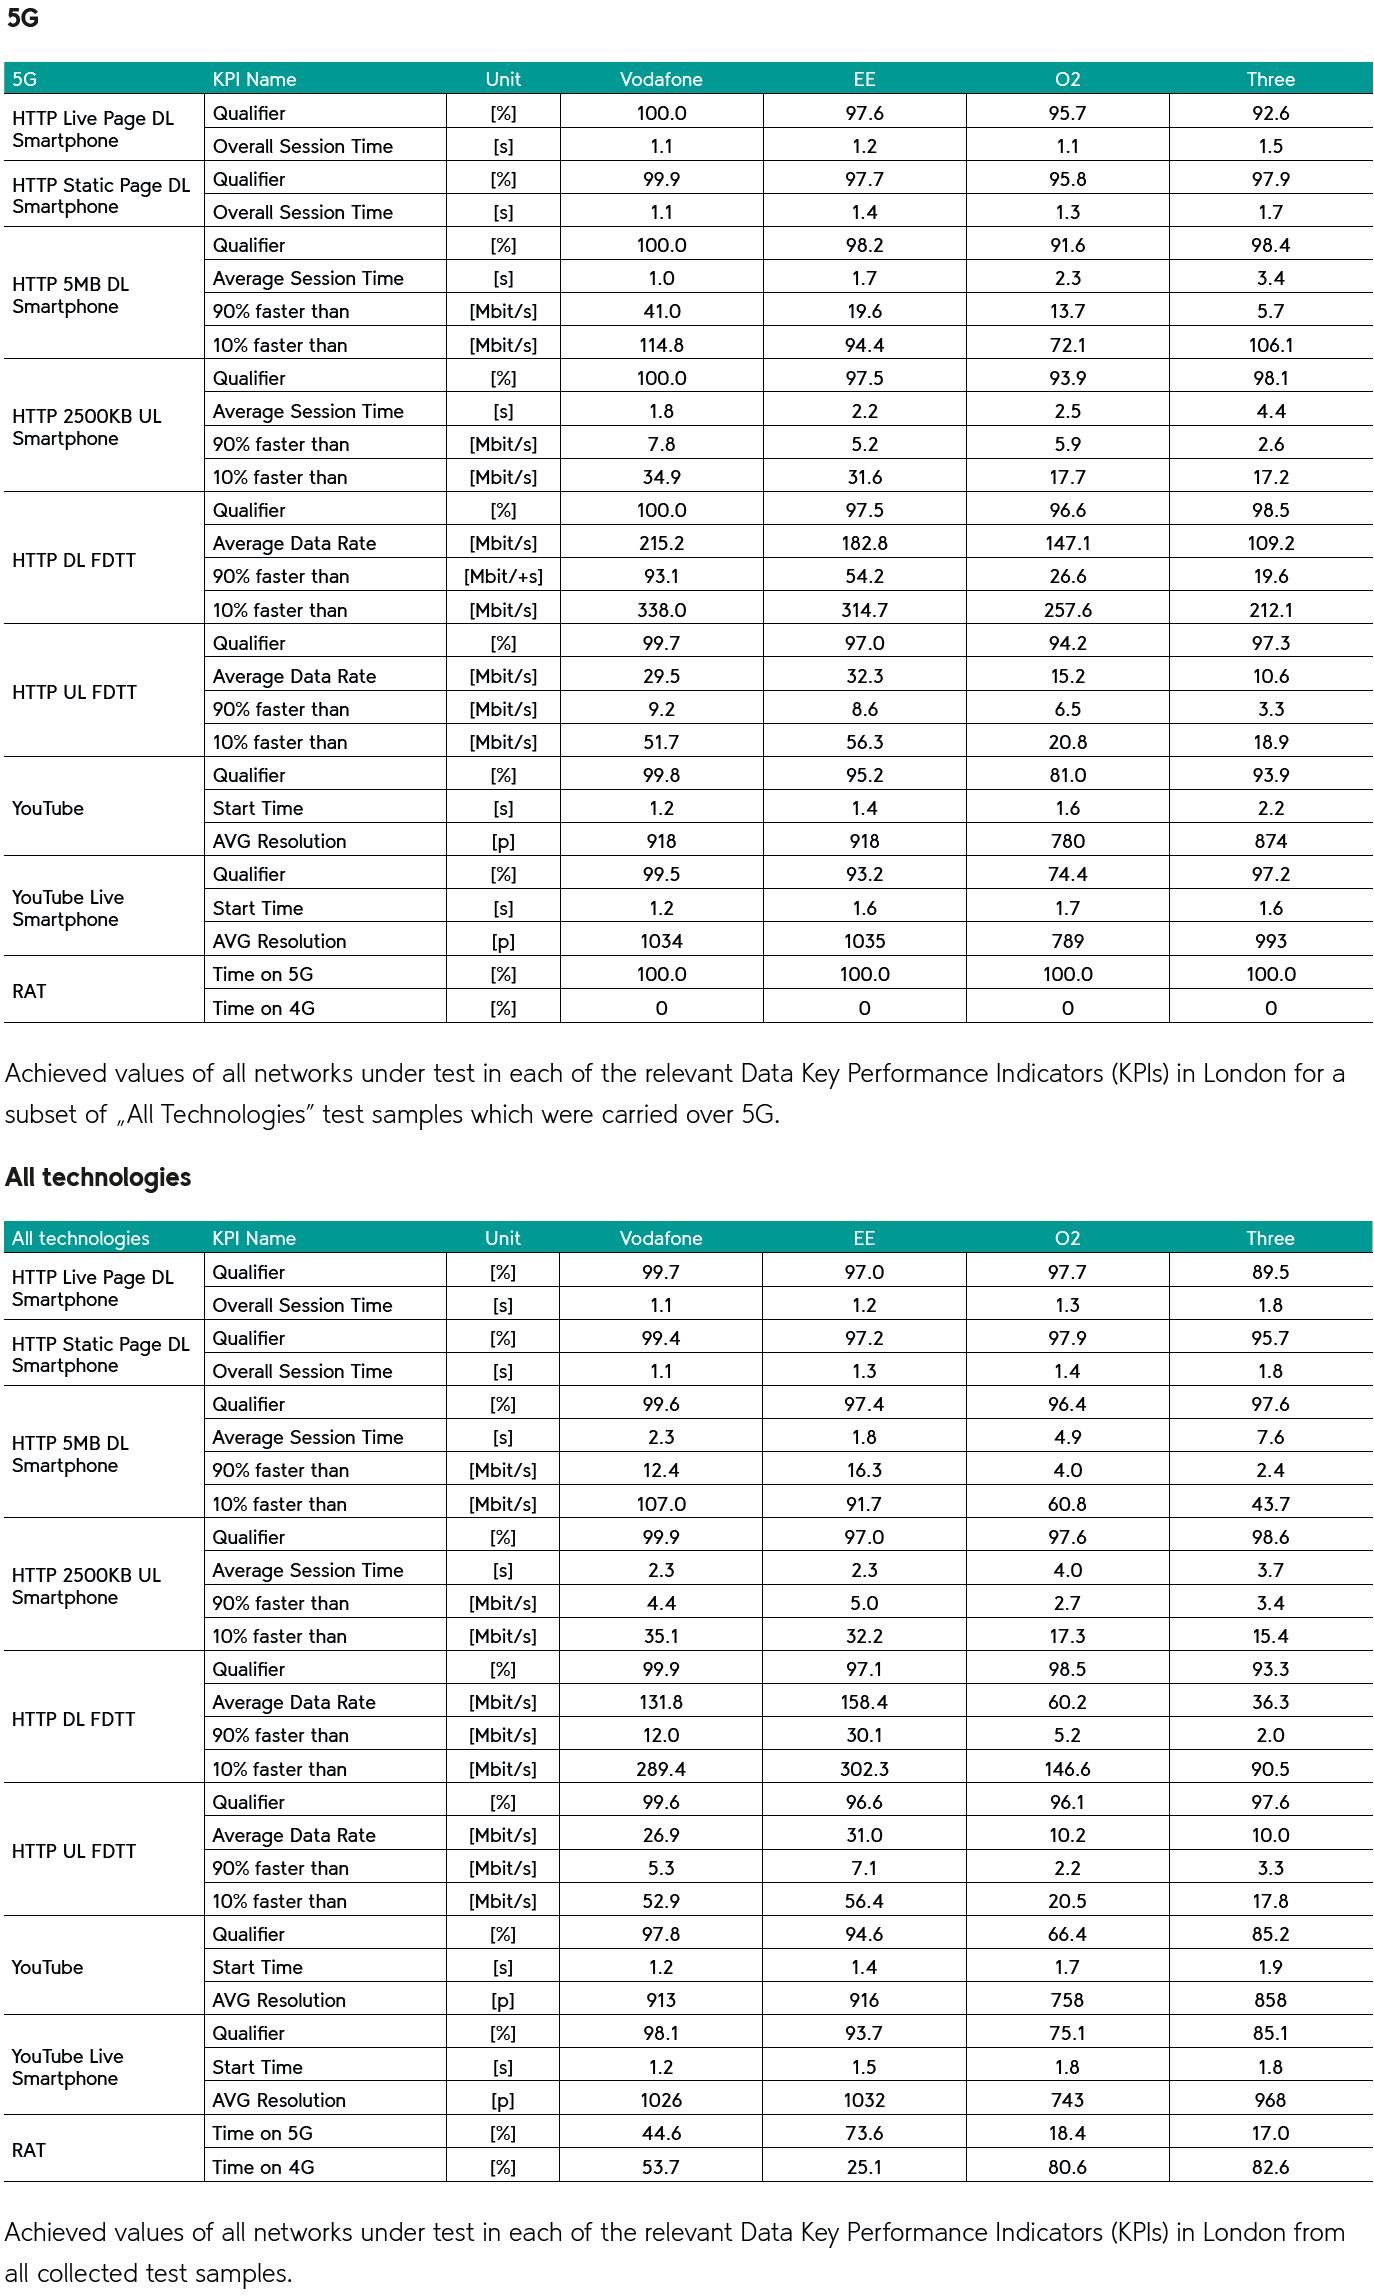 umlaut_5g_london_2020_test_results